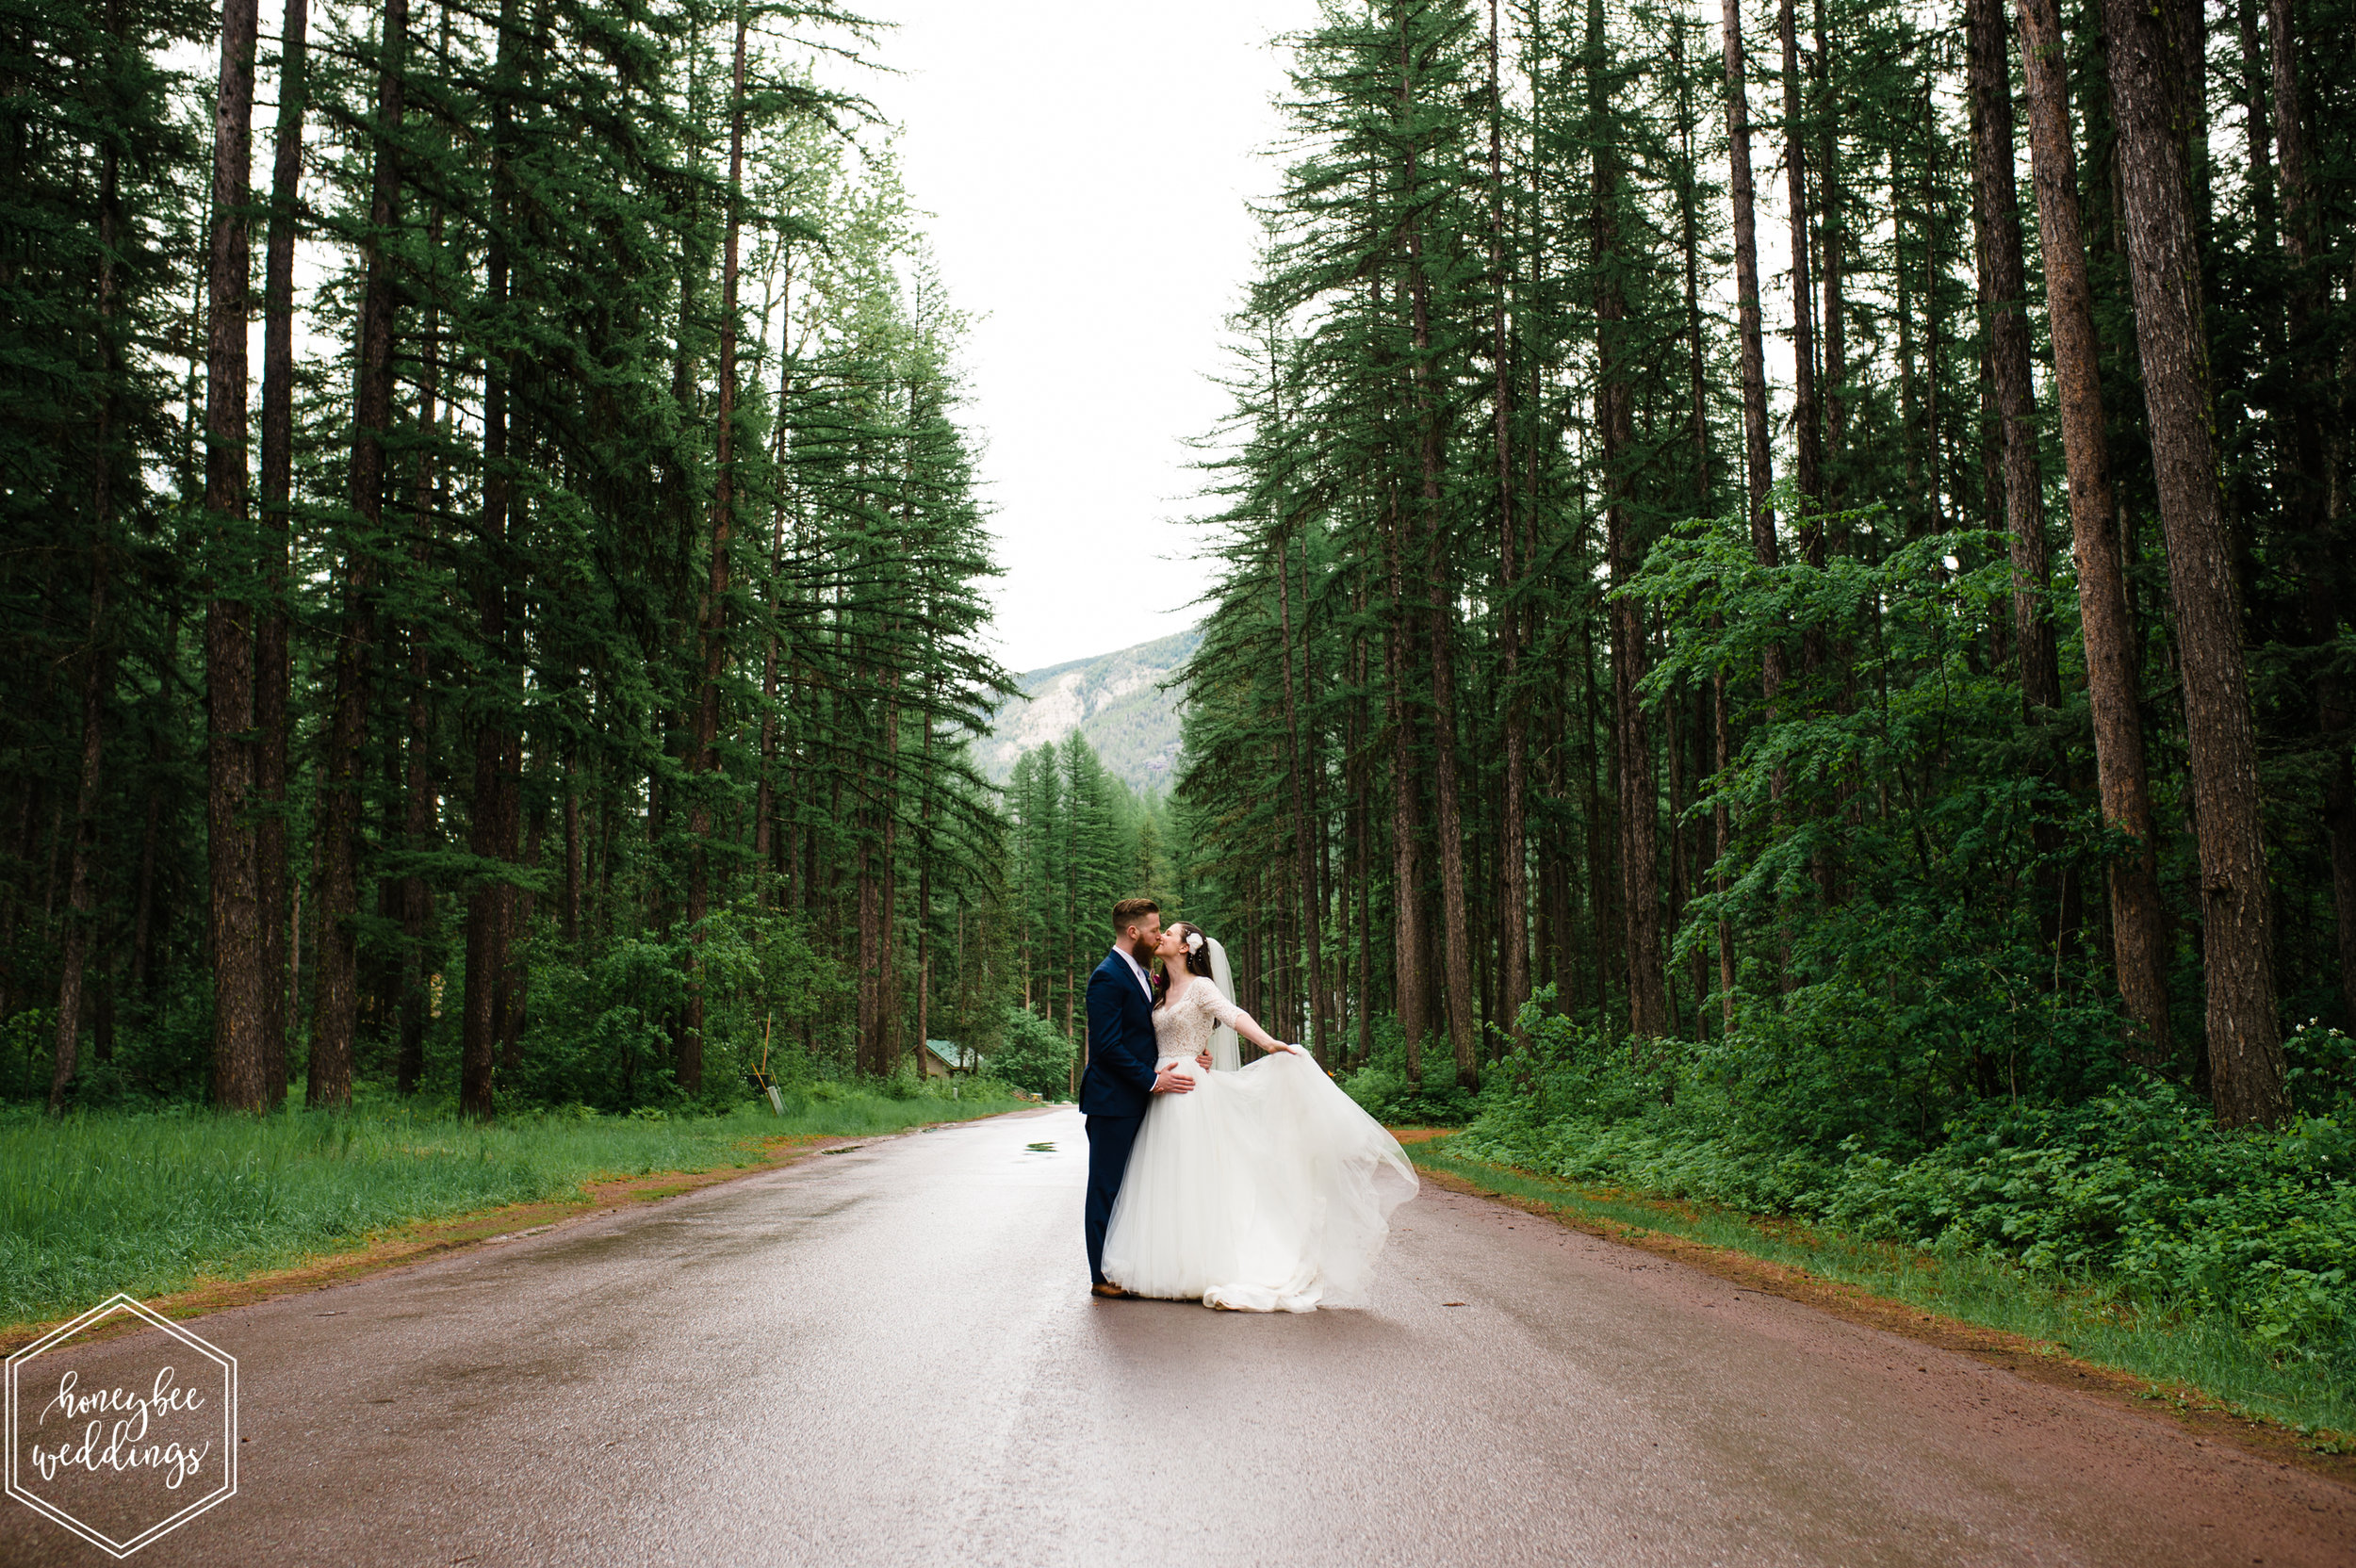 122Glacier National Park Wedding_Izaak Walton Inn Wedding_Honeybee Weddings_Norah & Kyle_June 08, 2019-819.jpg